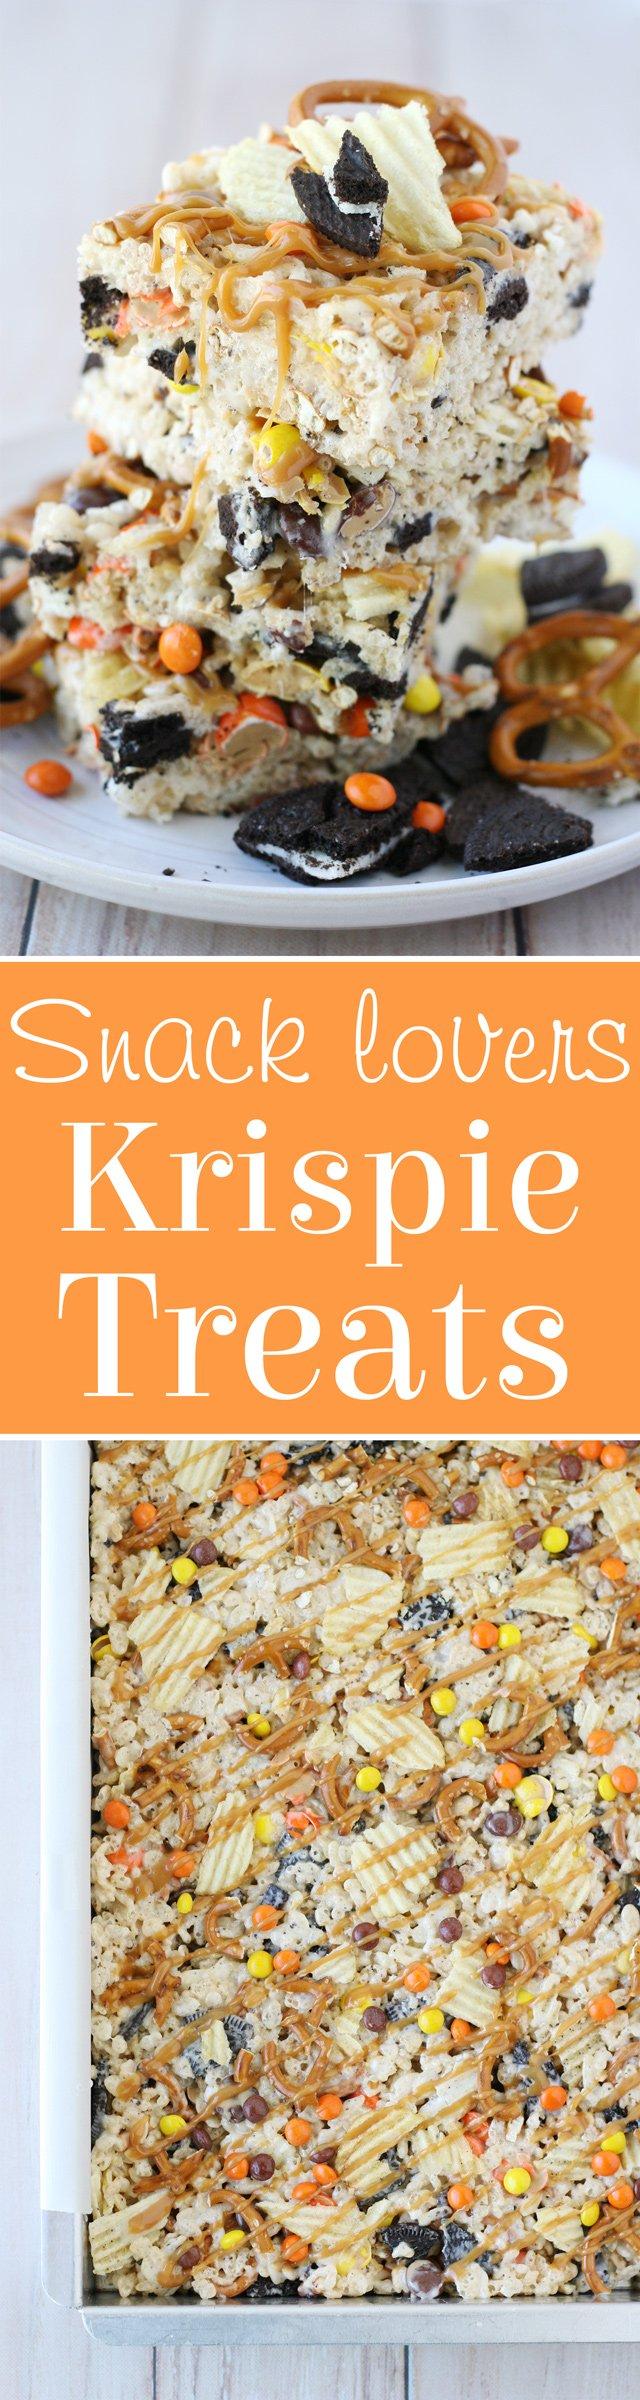 Snack Lovers Krispie Treats... sweet, salty and simply AMAZING!